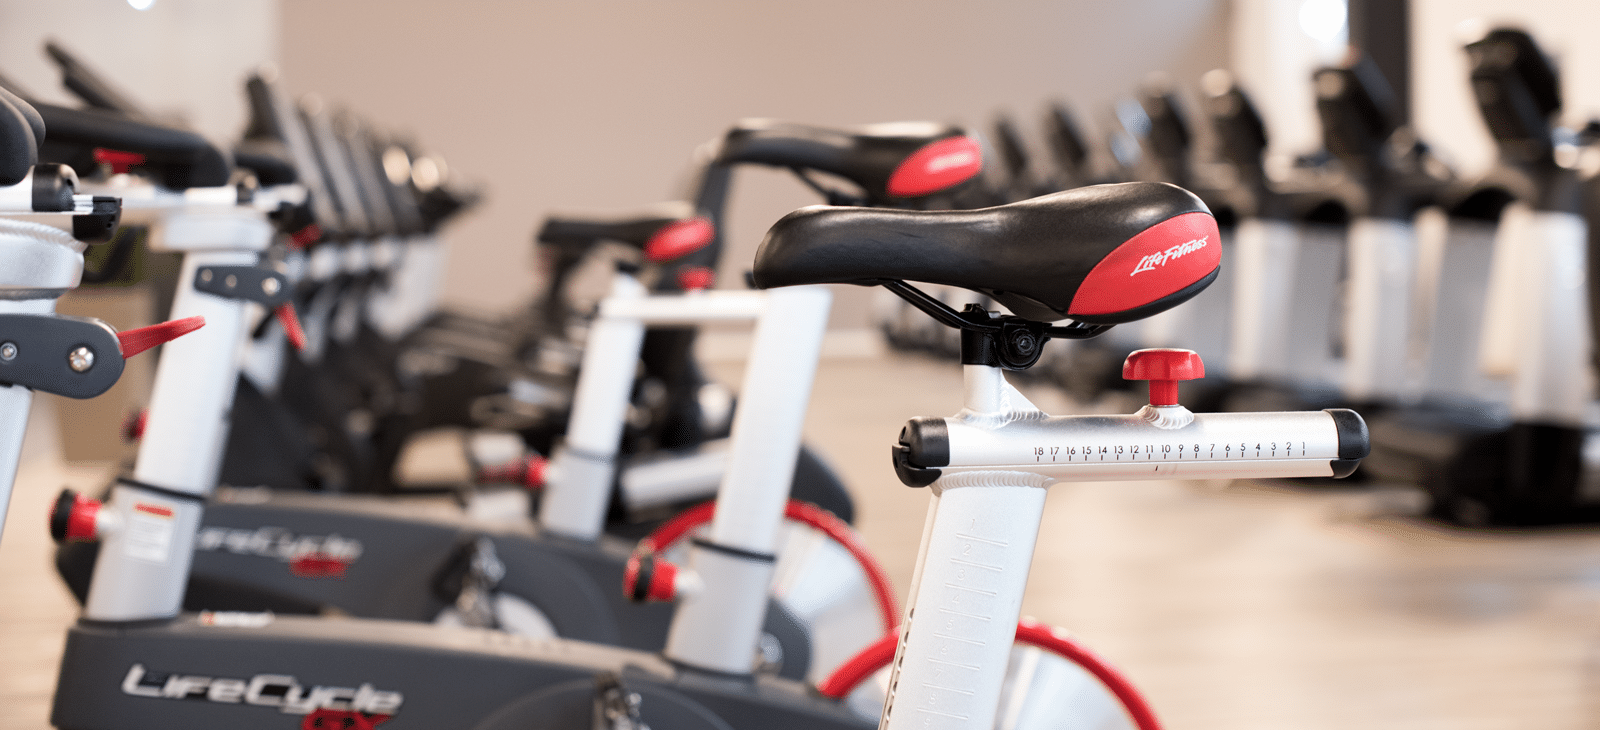 Cycling-kraft-werk-Gundelfingen-1600x730px